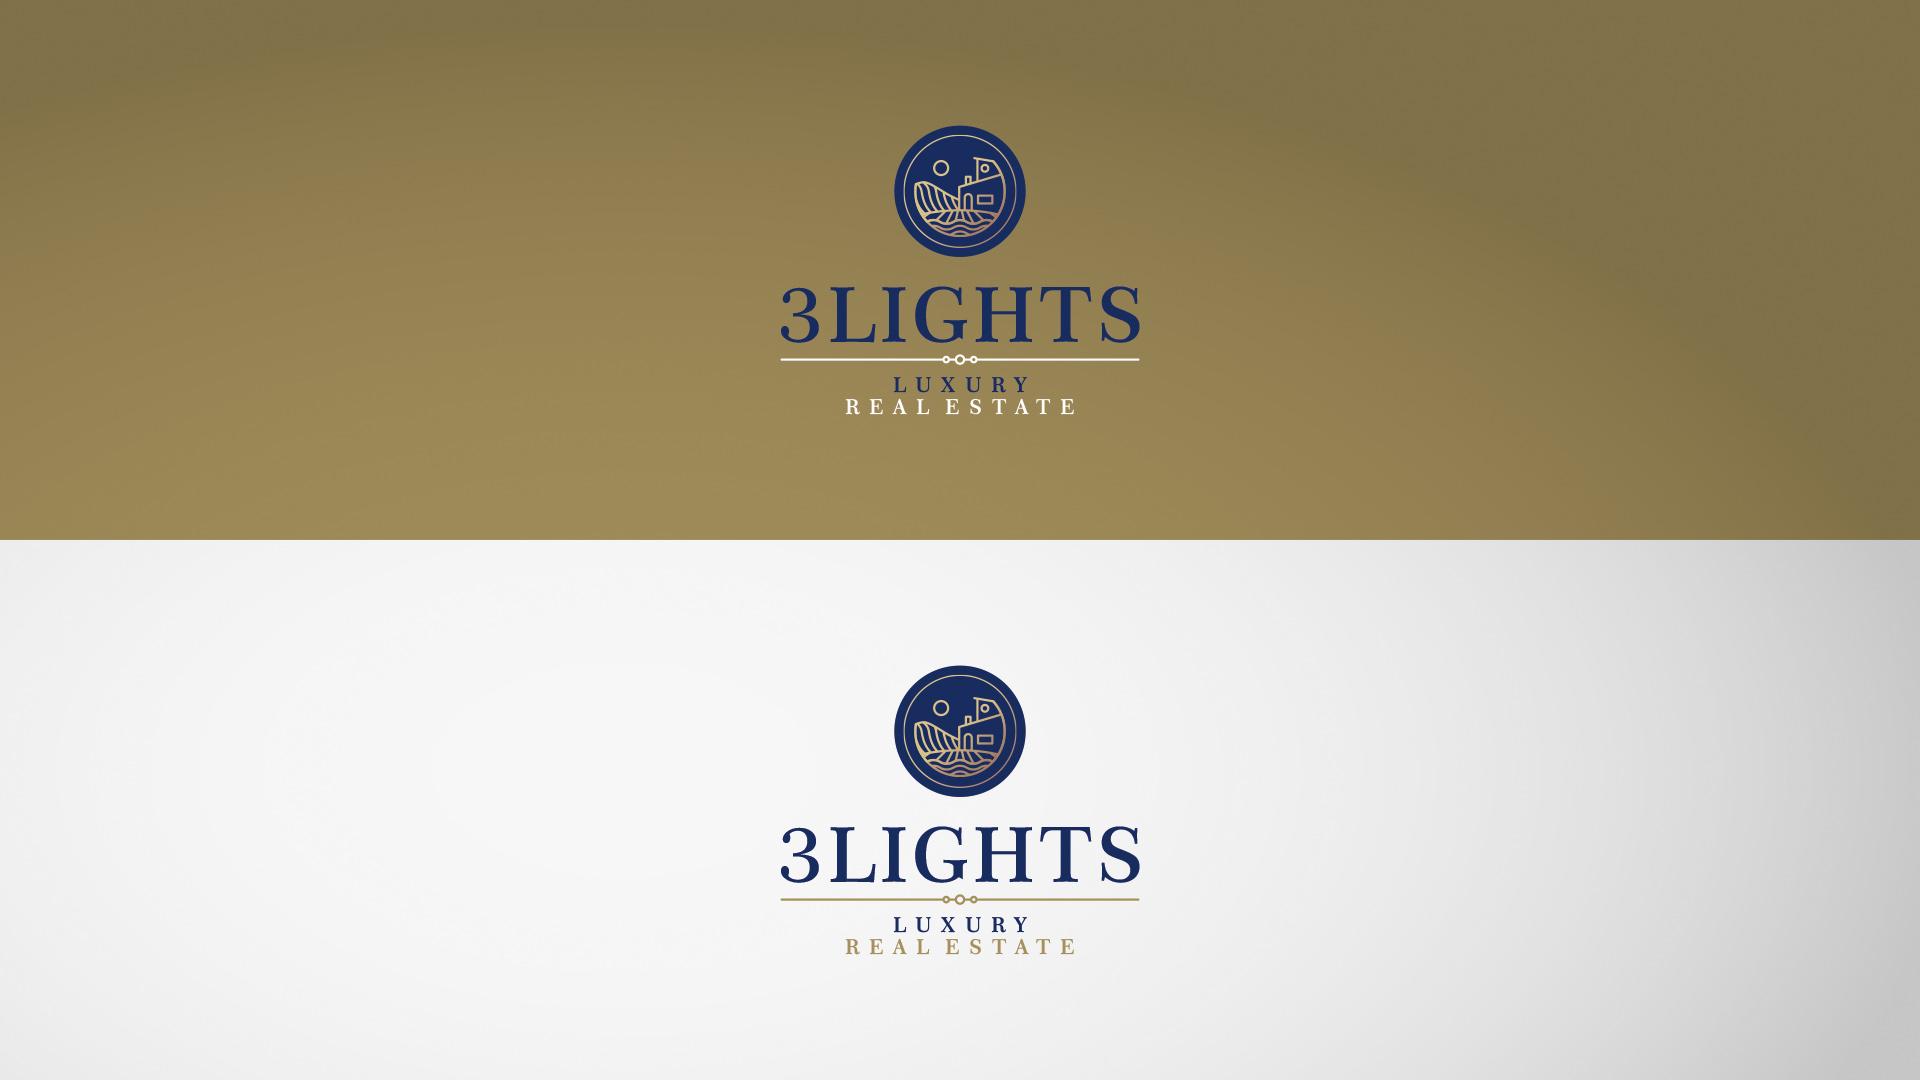 3Lights Luxury Real Estate